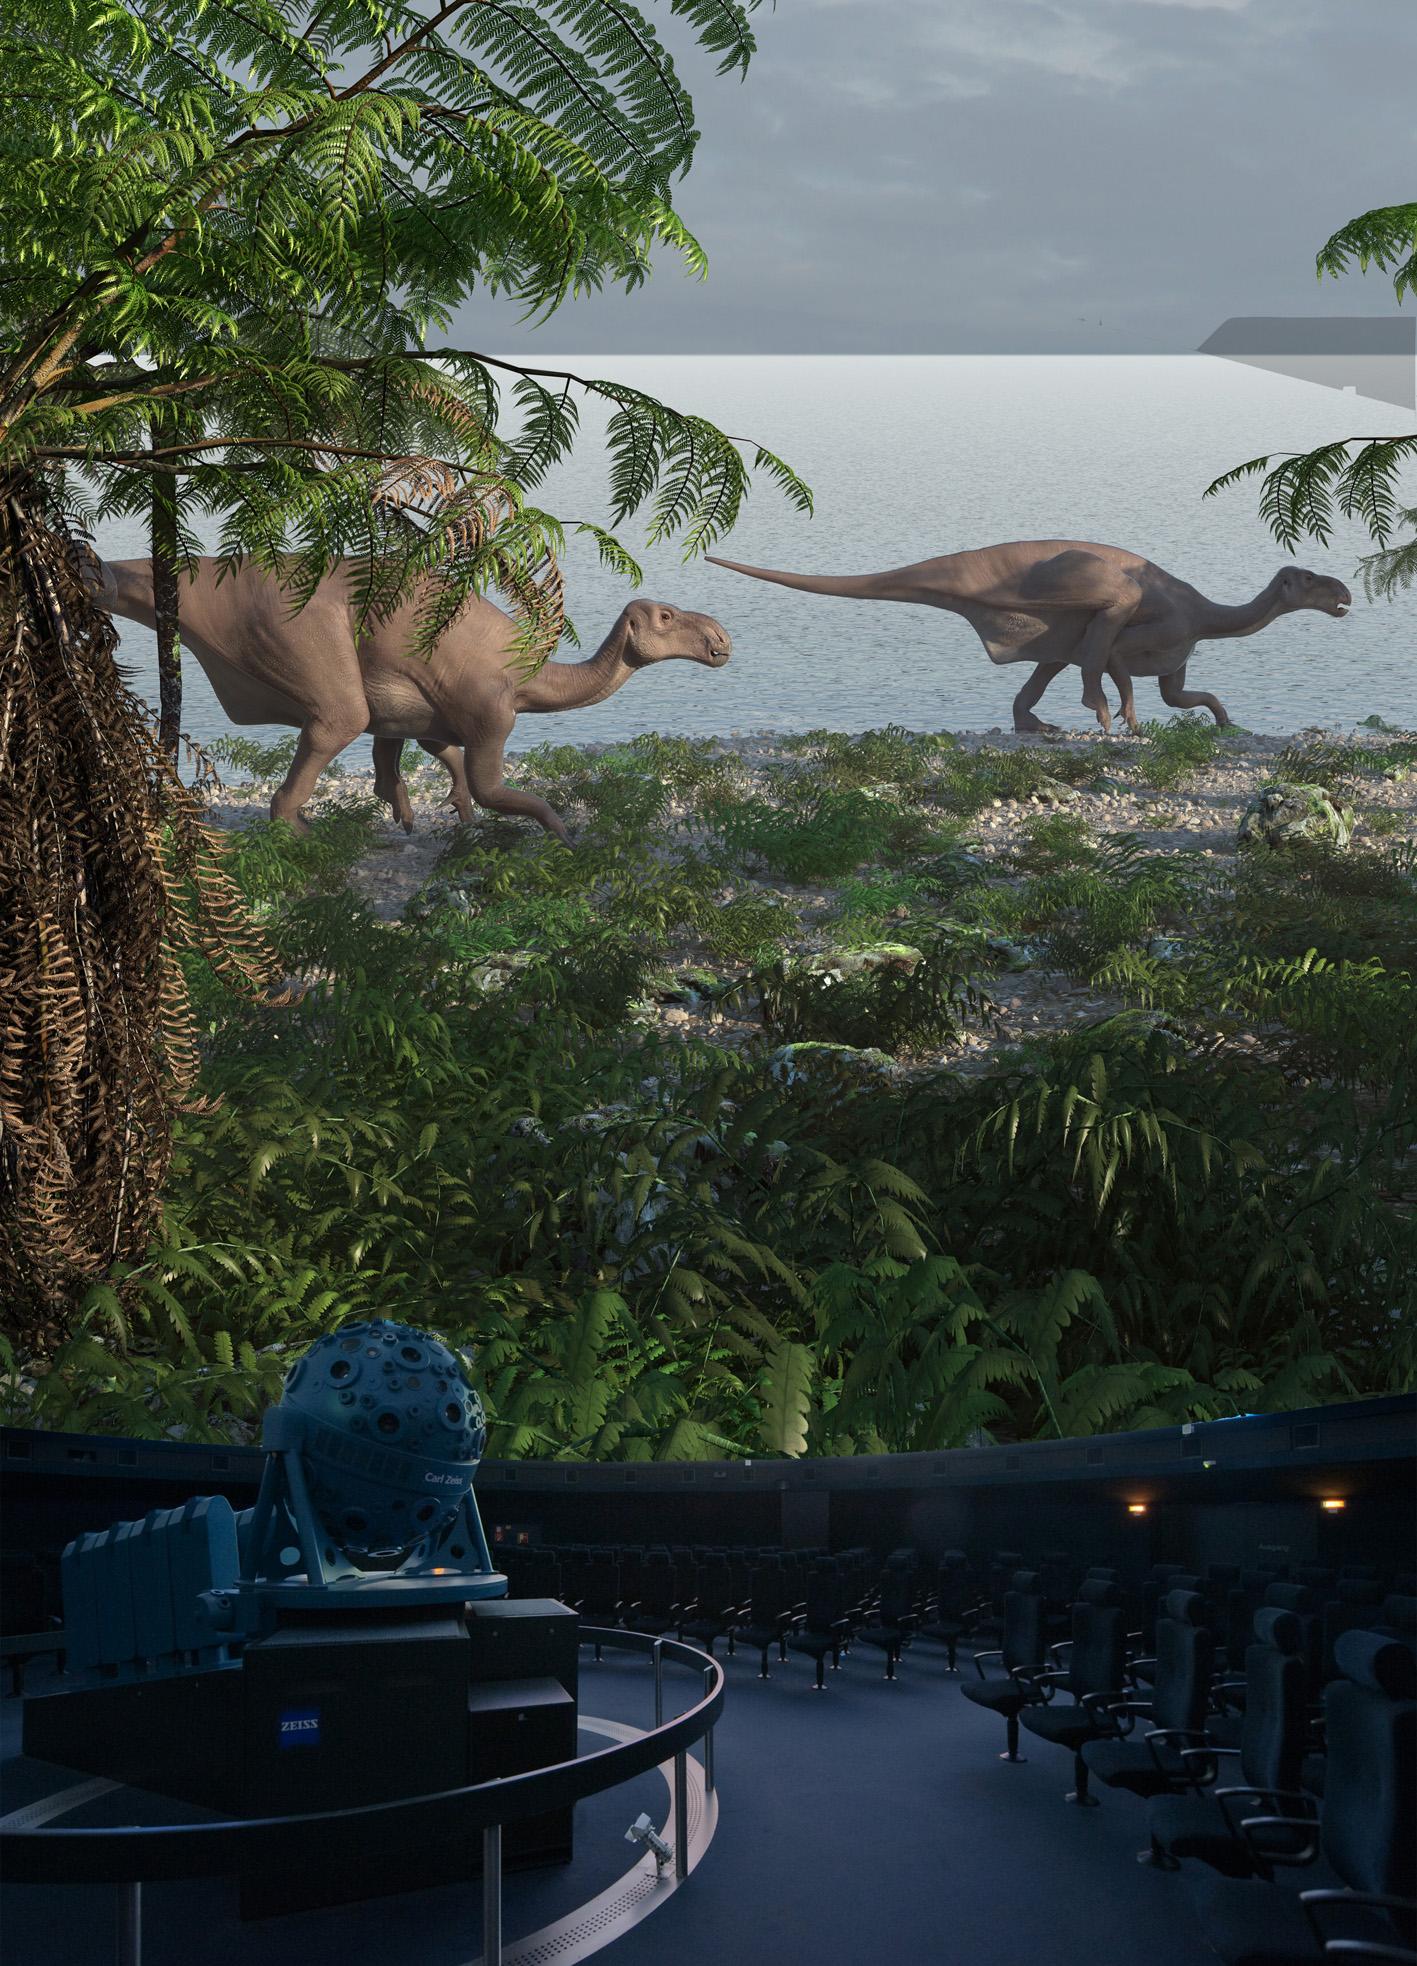 Bilddatei: Dinowerbung(C)Mirage3D+LWL.jpg